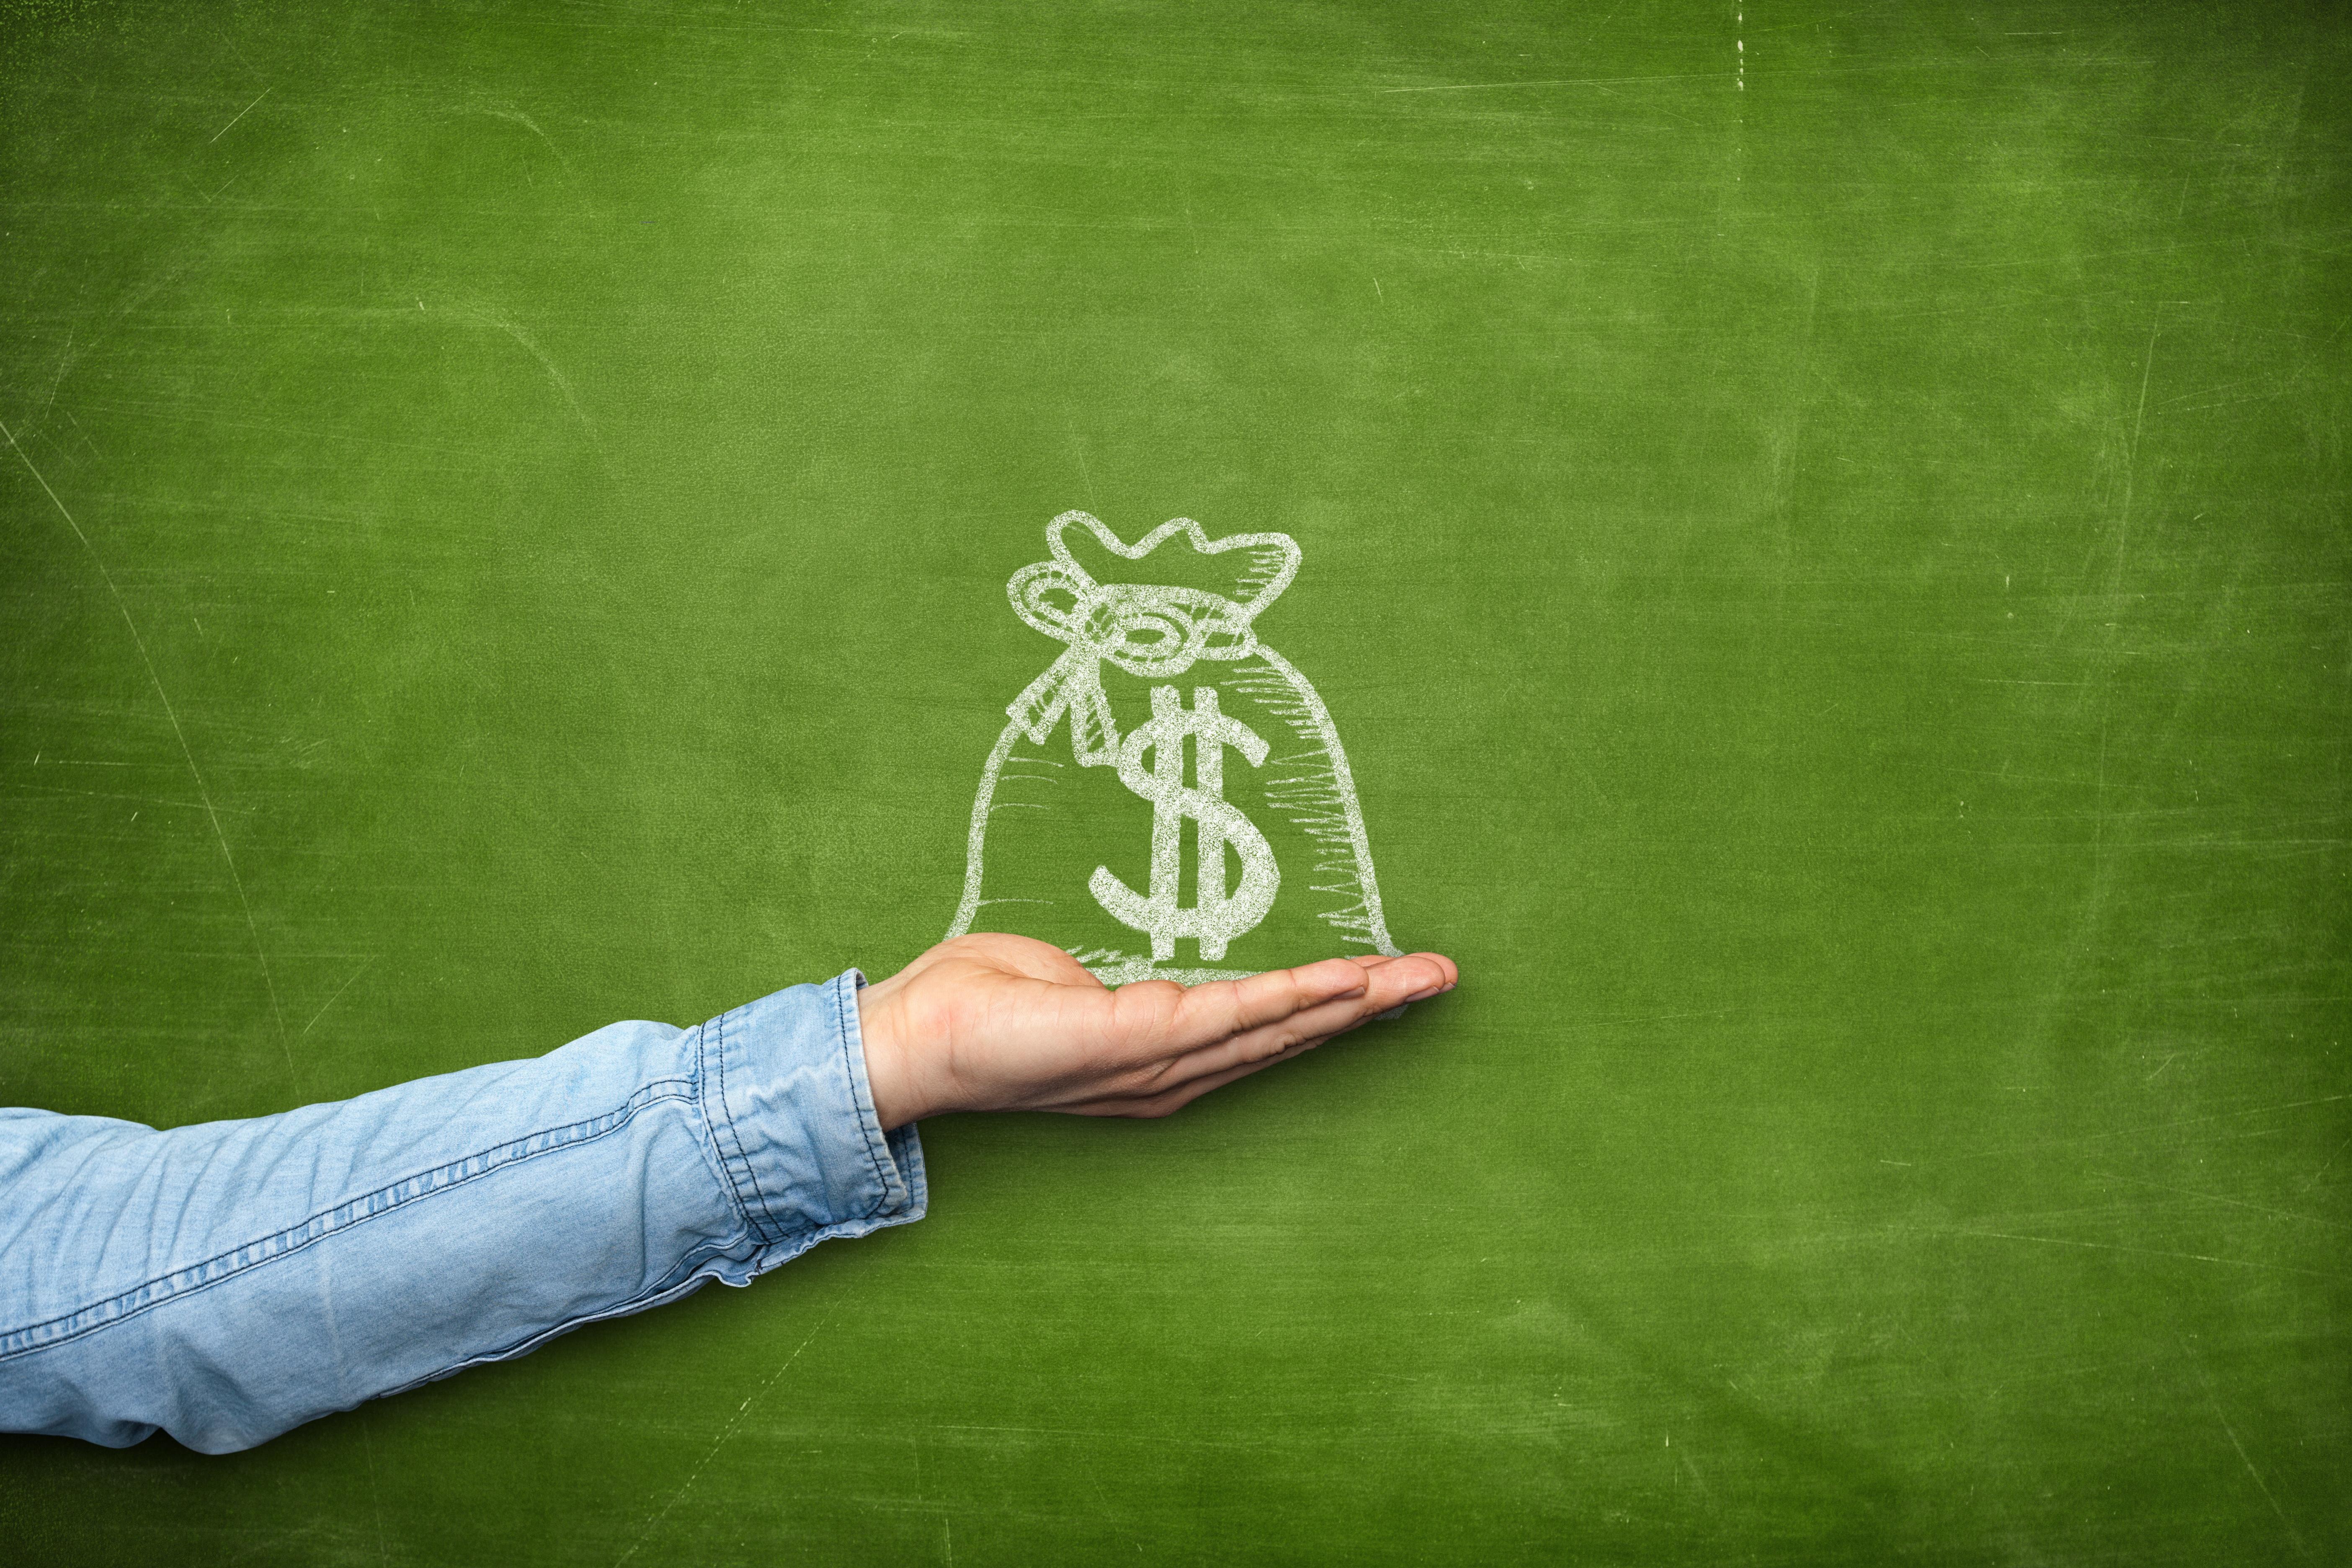 Auto-enrollment boosts retirement saving